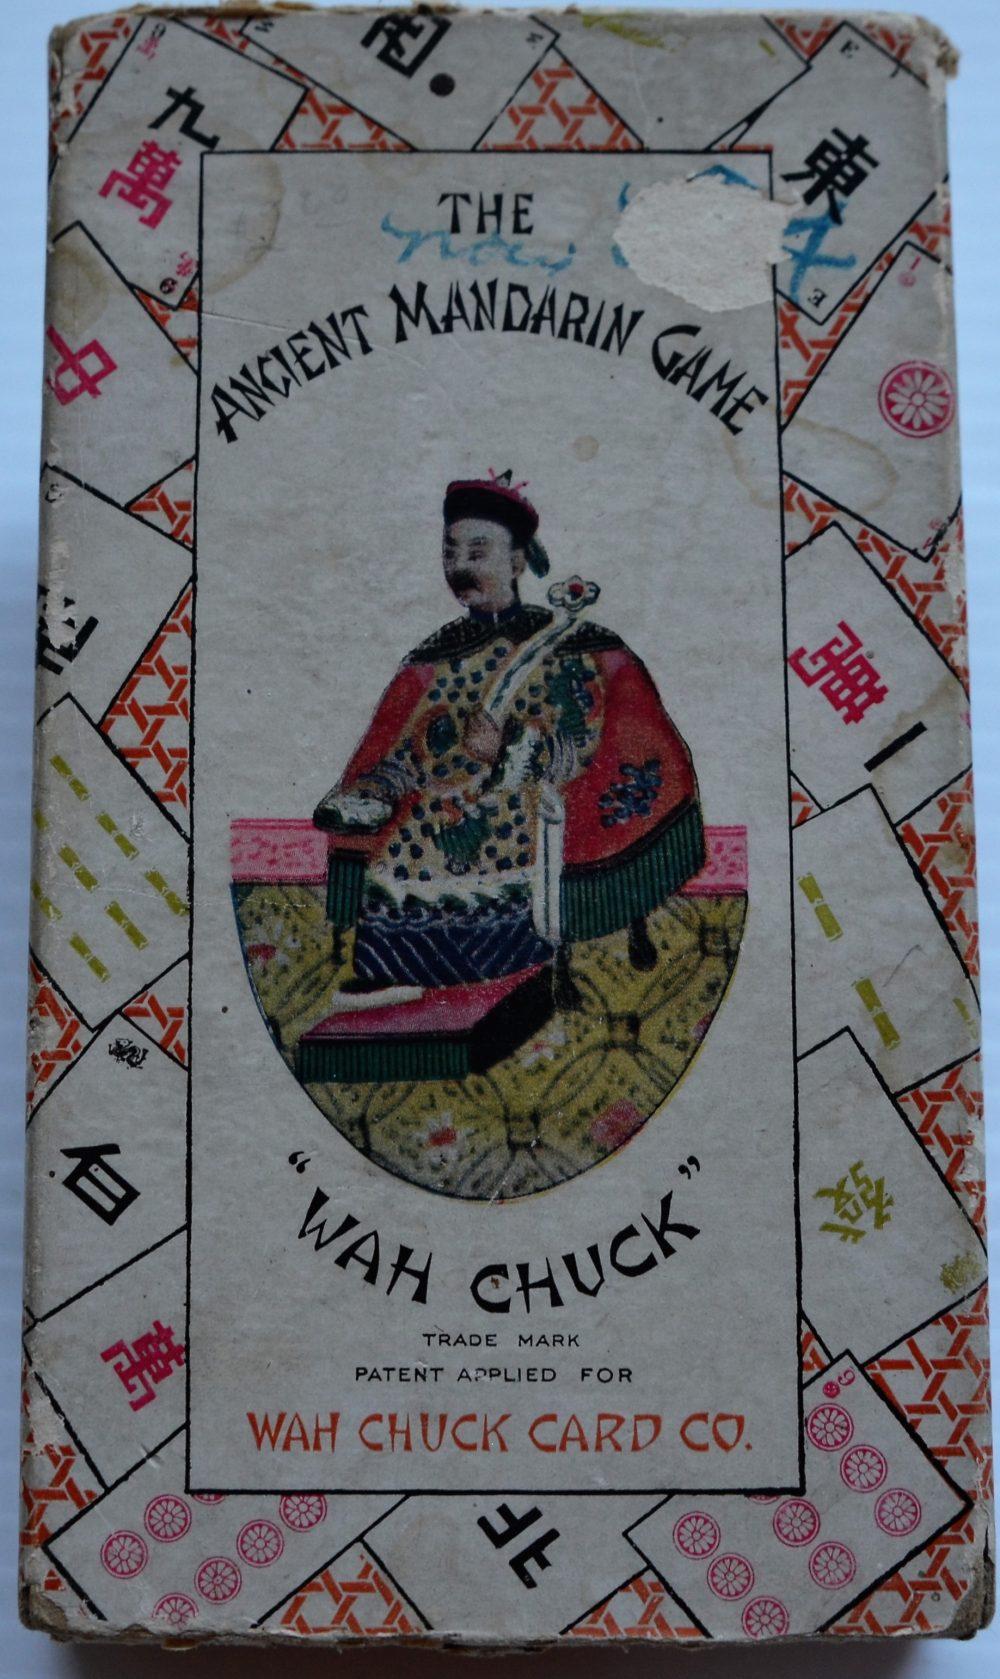 LAW 20_0700_D. Wah Chuk Card Co.